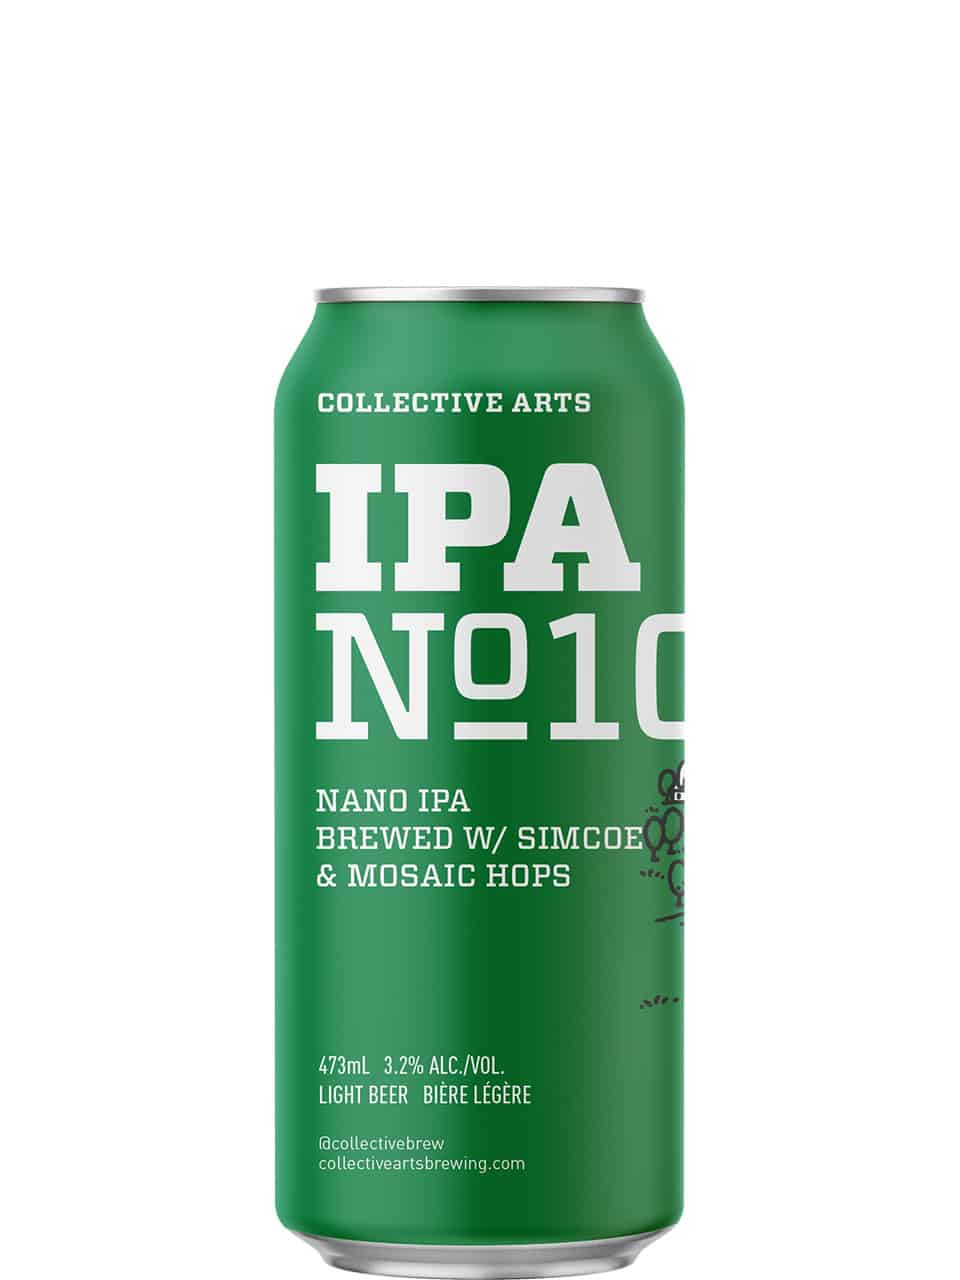 Collective Arts IPA No.10 Double-Hopped NANO IPA